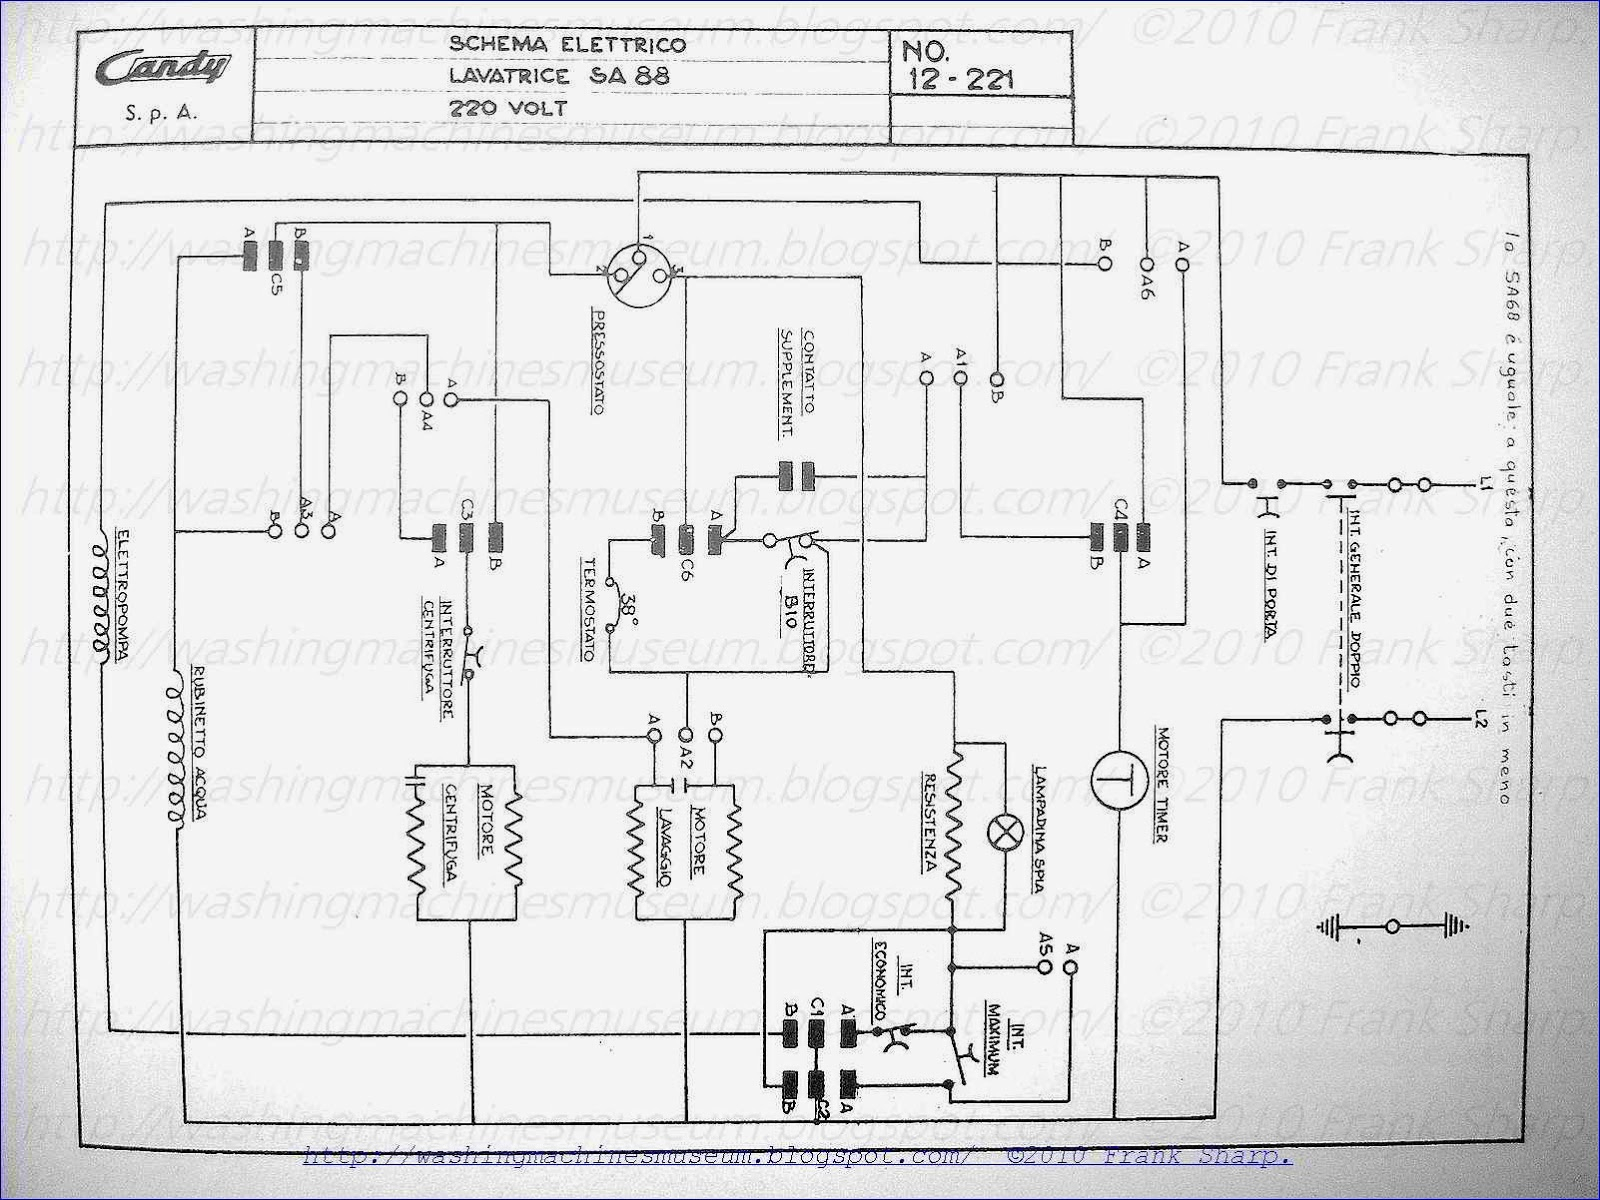 washing machine wiring diagram and schematics gallery wiringwashing machine wiring diagram and schematics collection candy sa88 schematic diagram 10 q download wiring diagram pics detail name washing machine